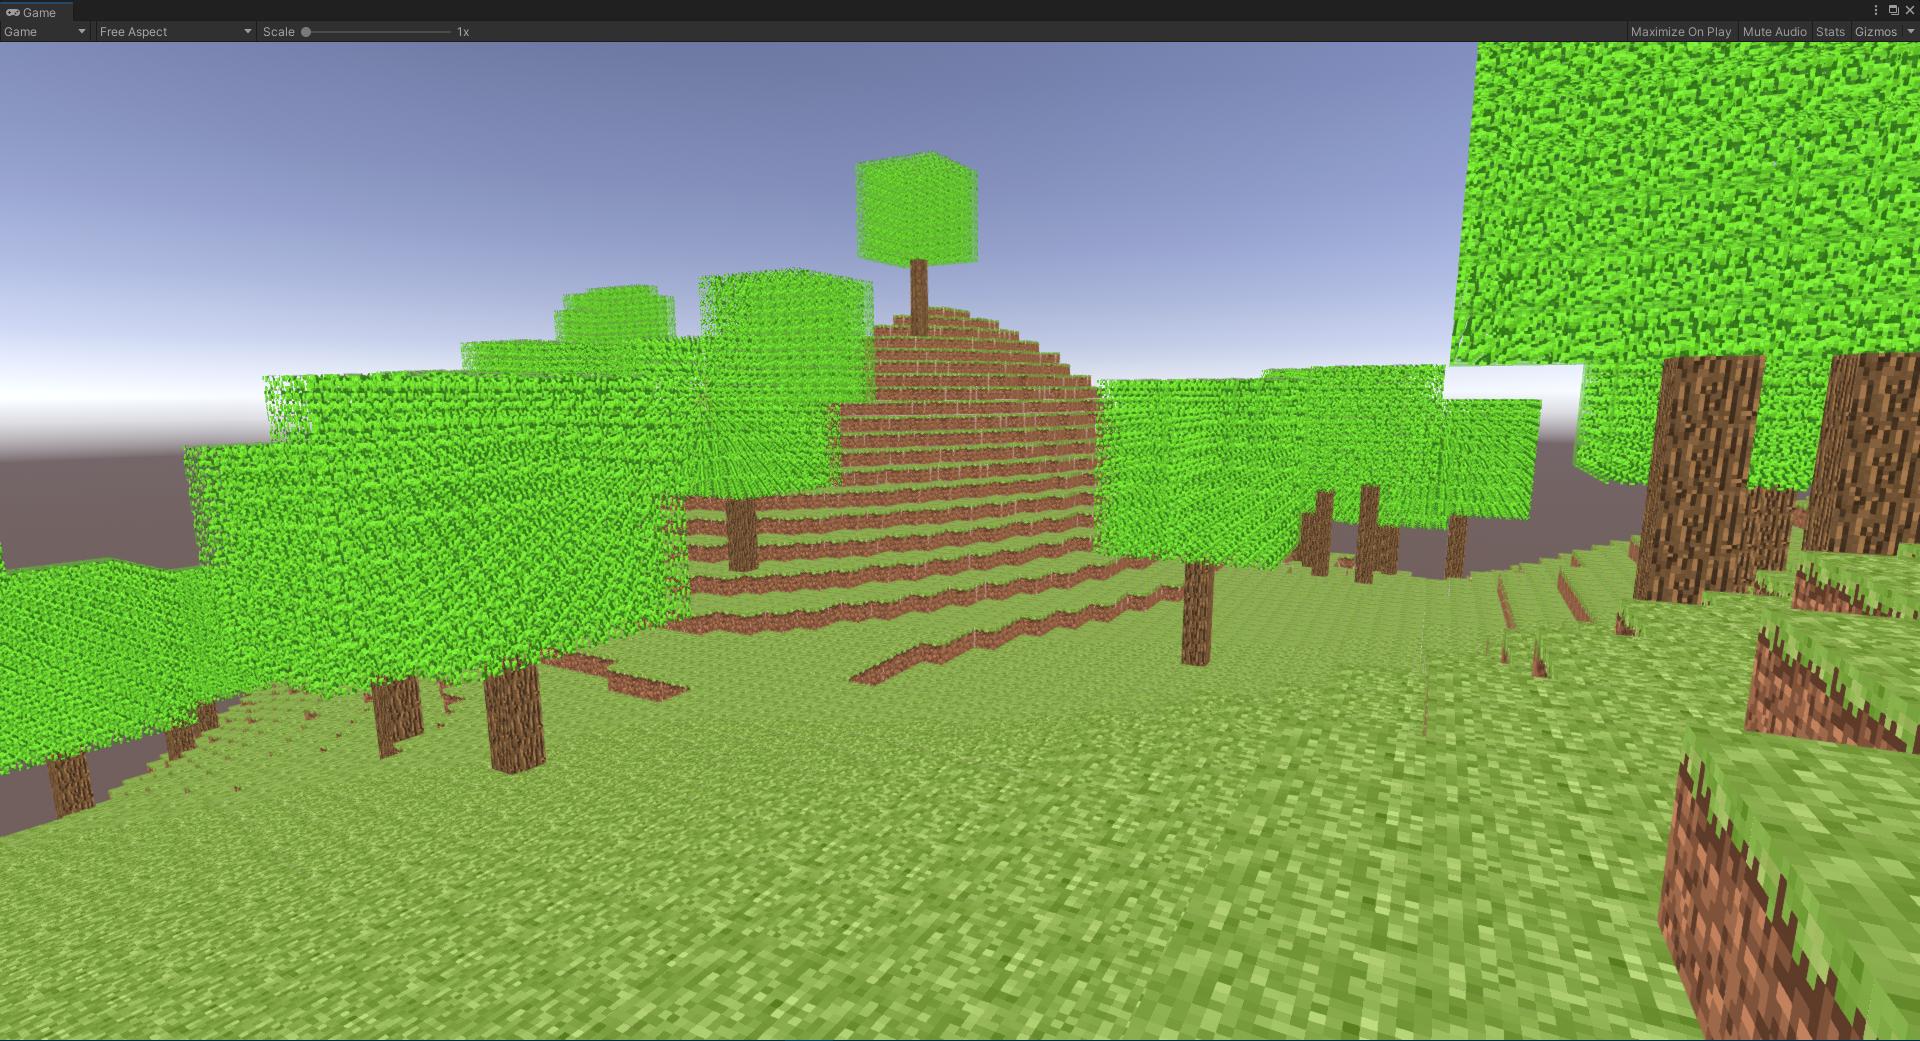 Minecraft - Voxel Terrain Generator